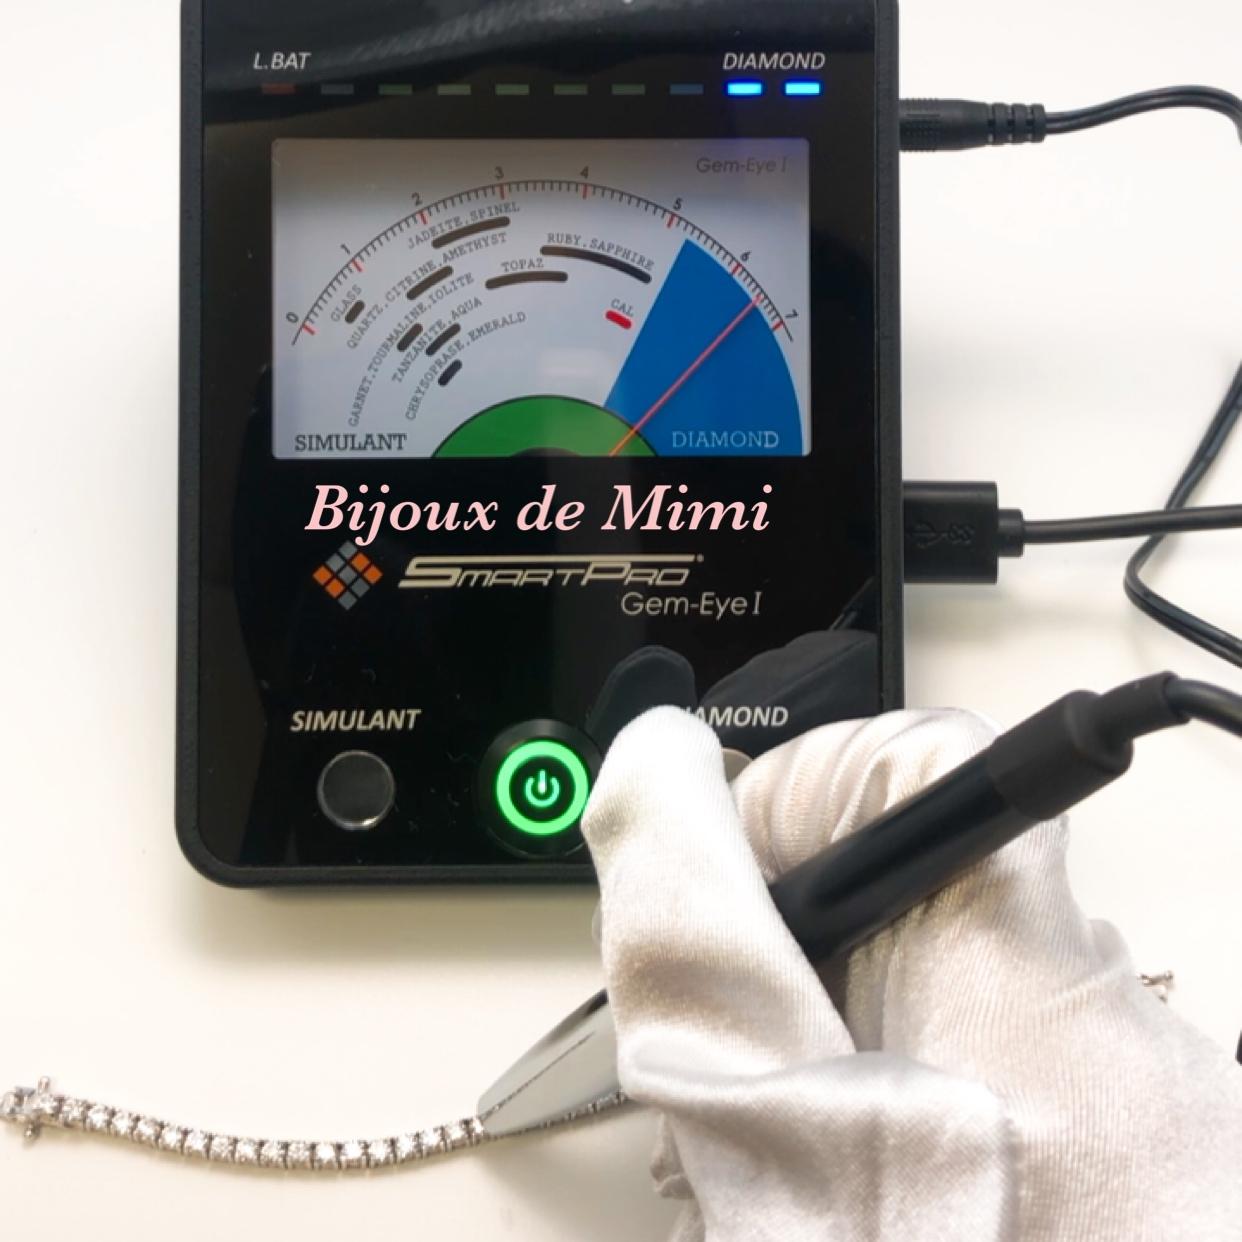 Bijoux de Mimiはモアサナイトの正規取扱店です